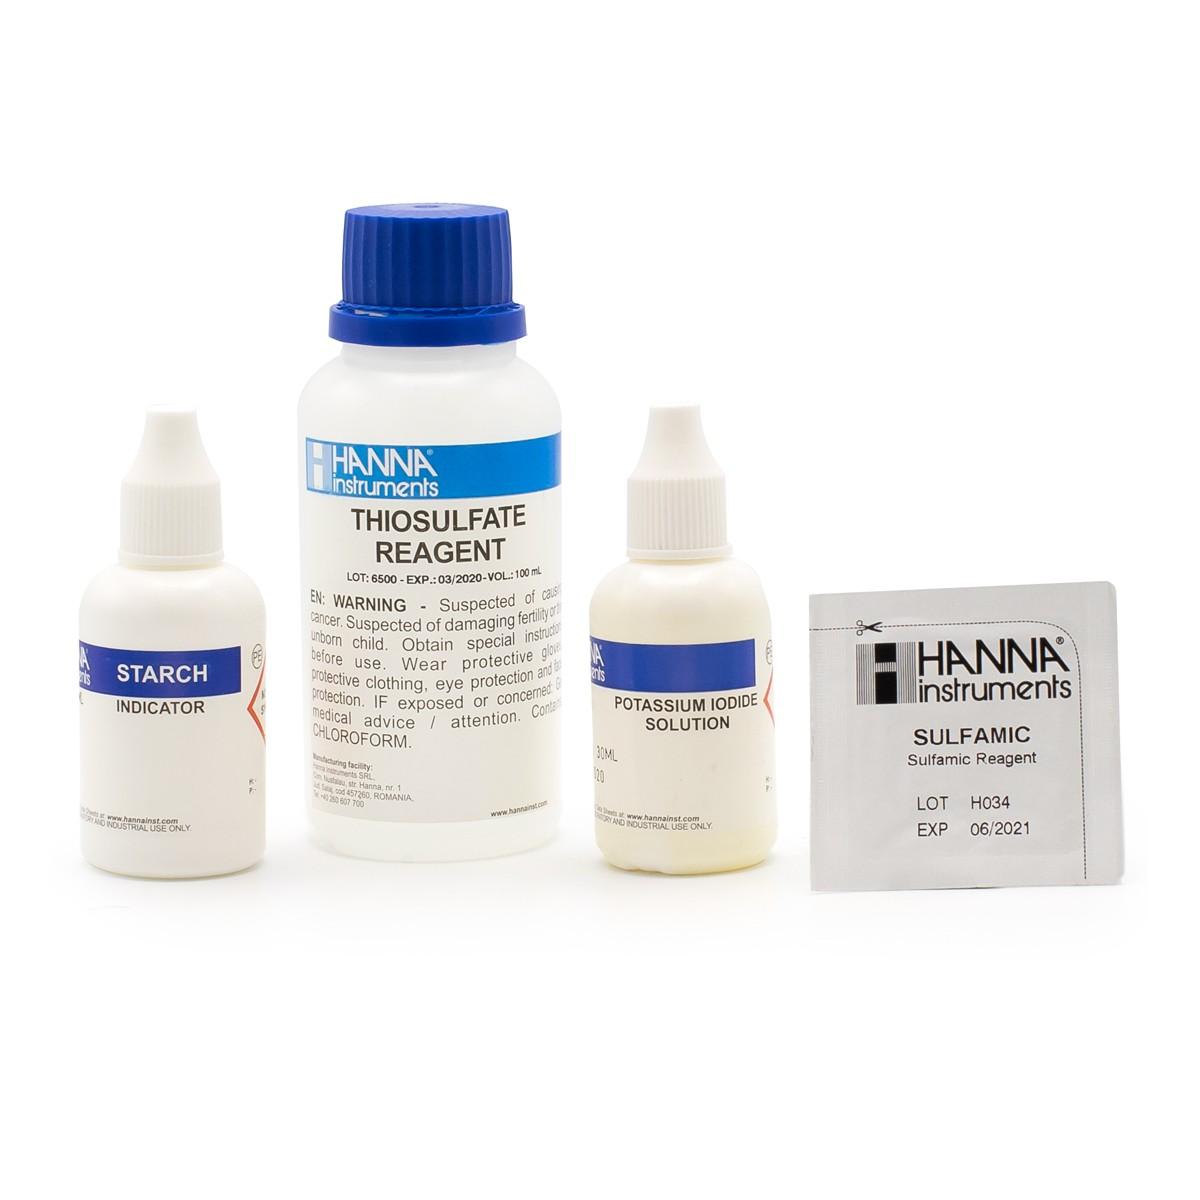 Total Chlorine High Range Test Kit Replacement Reagents (100 tests) - HI38022-100